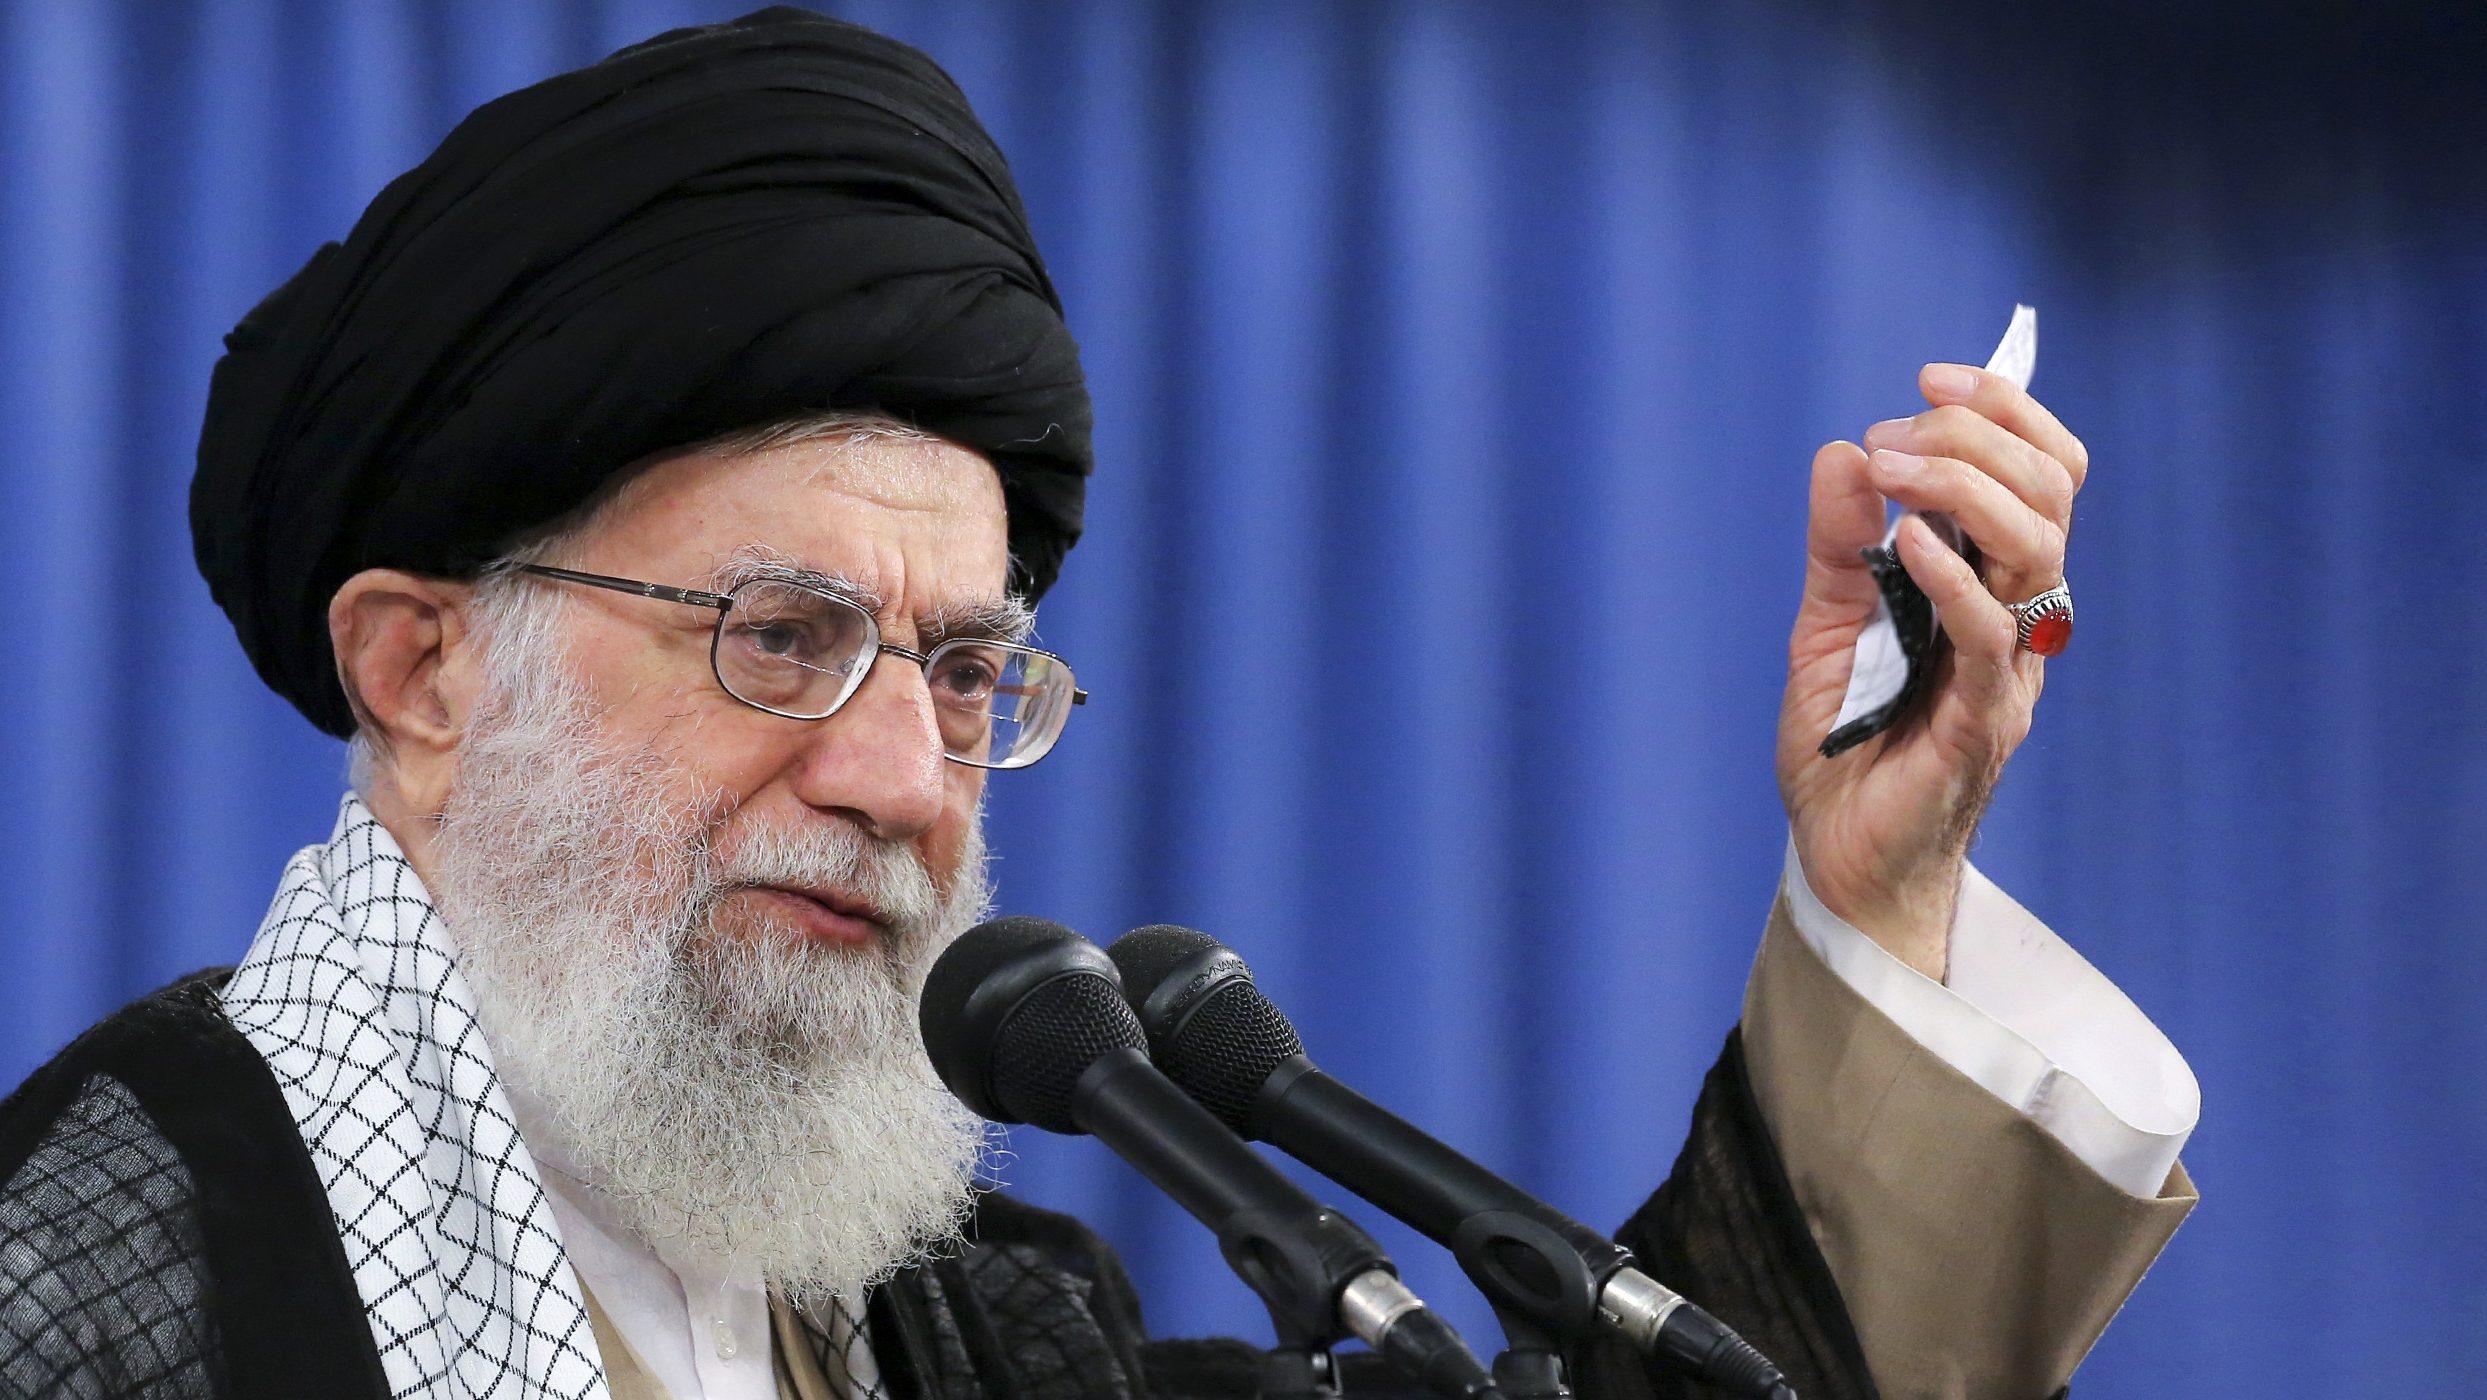 ranian supreme leader, Supreme Leader Ayatollah Ali Khamenei